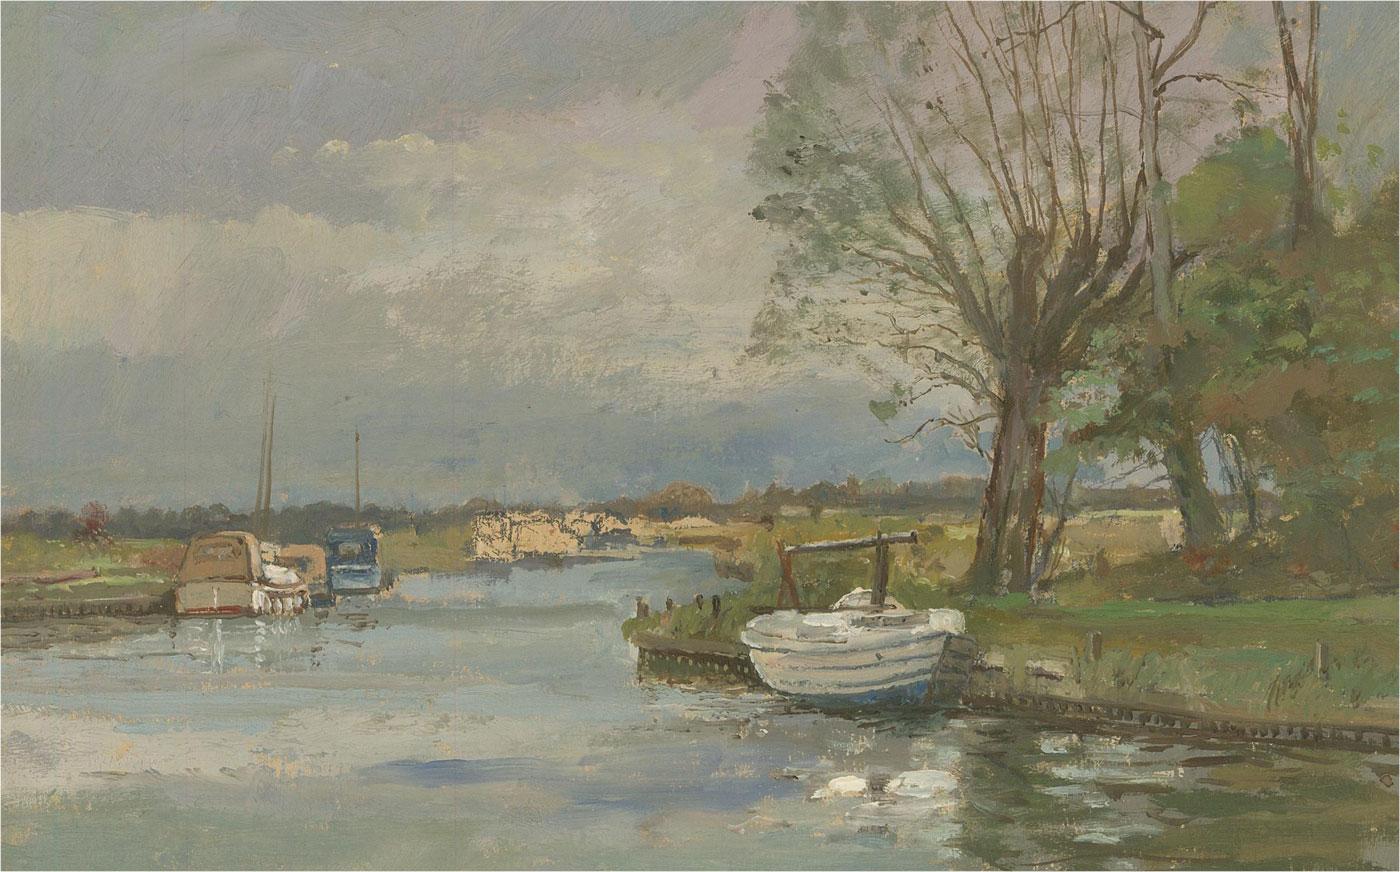 Keith Johnson (1931-2018) - Contemporary Oil, River Scene with Boats